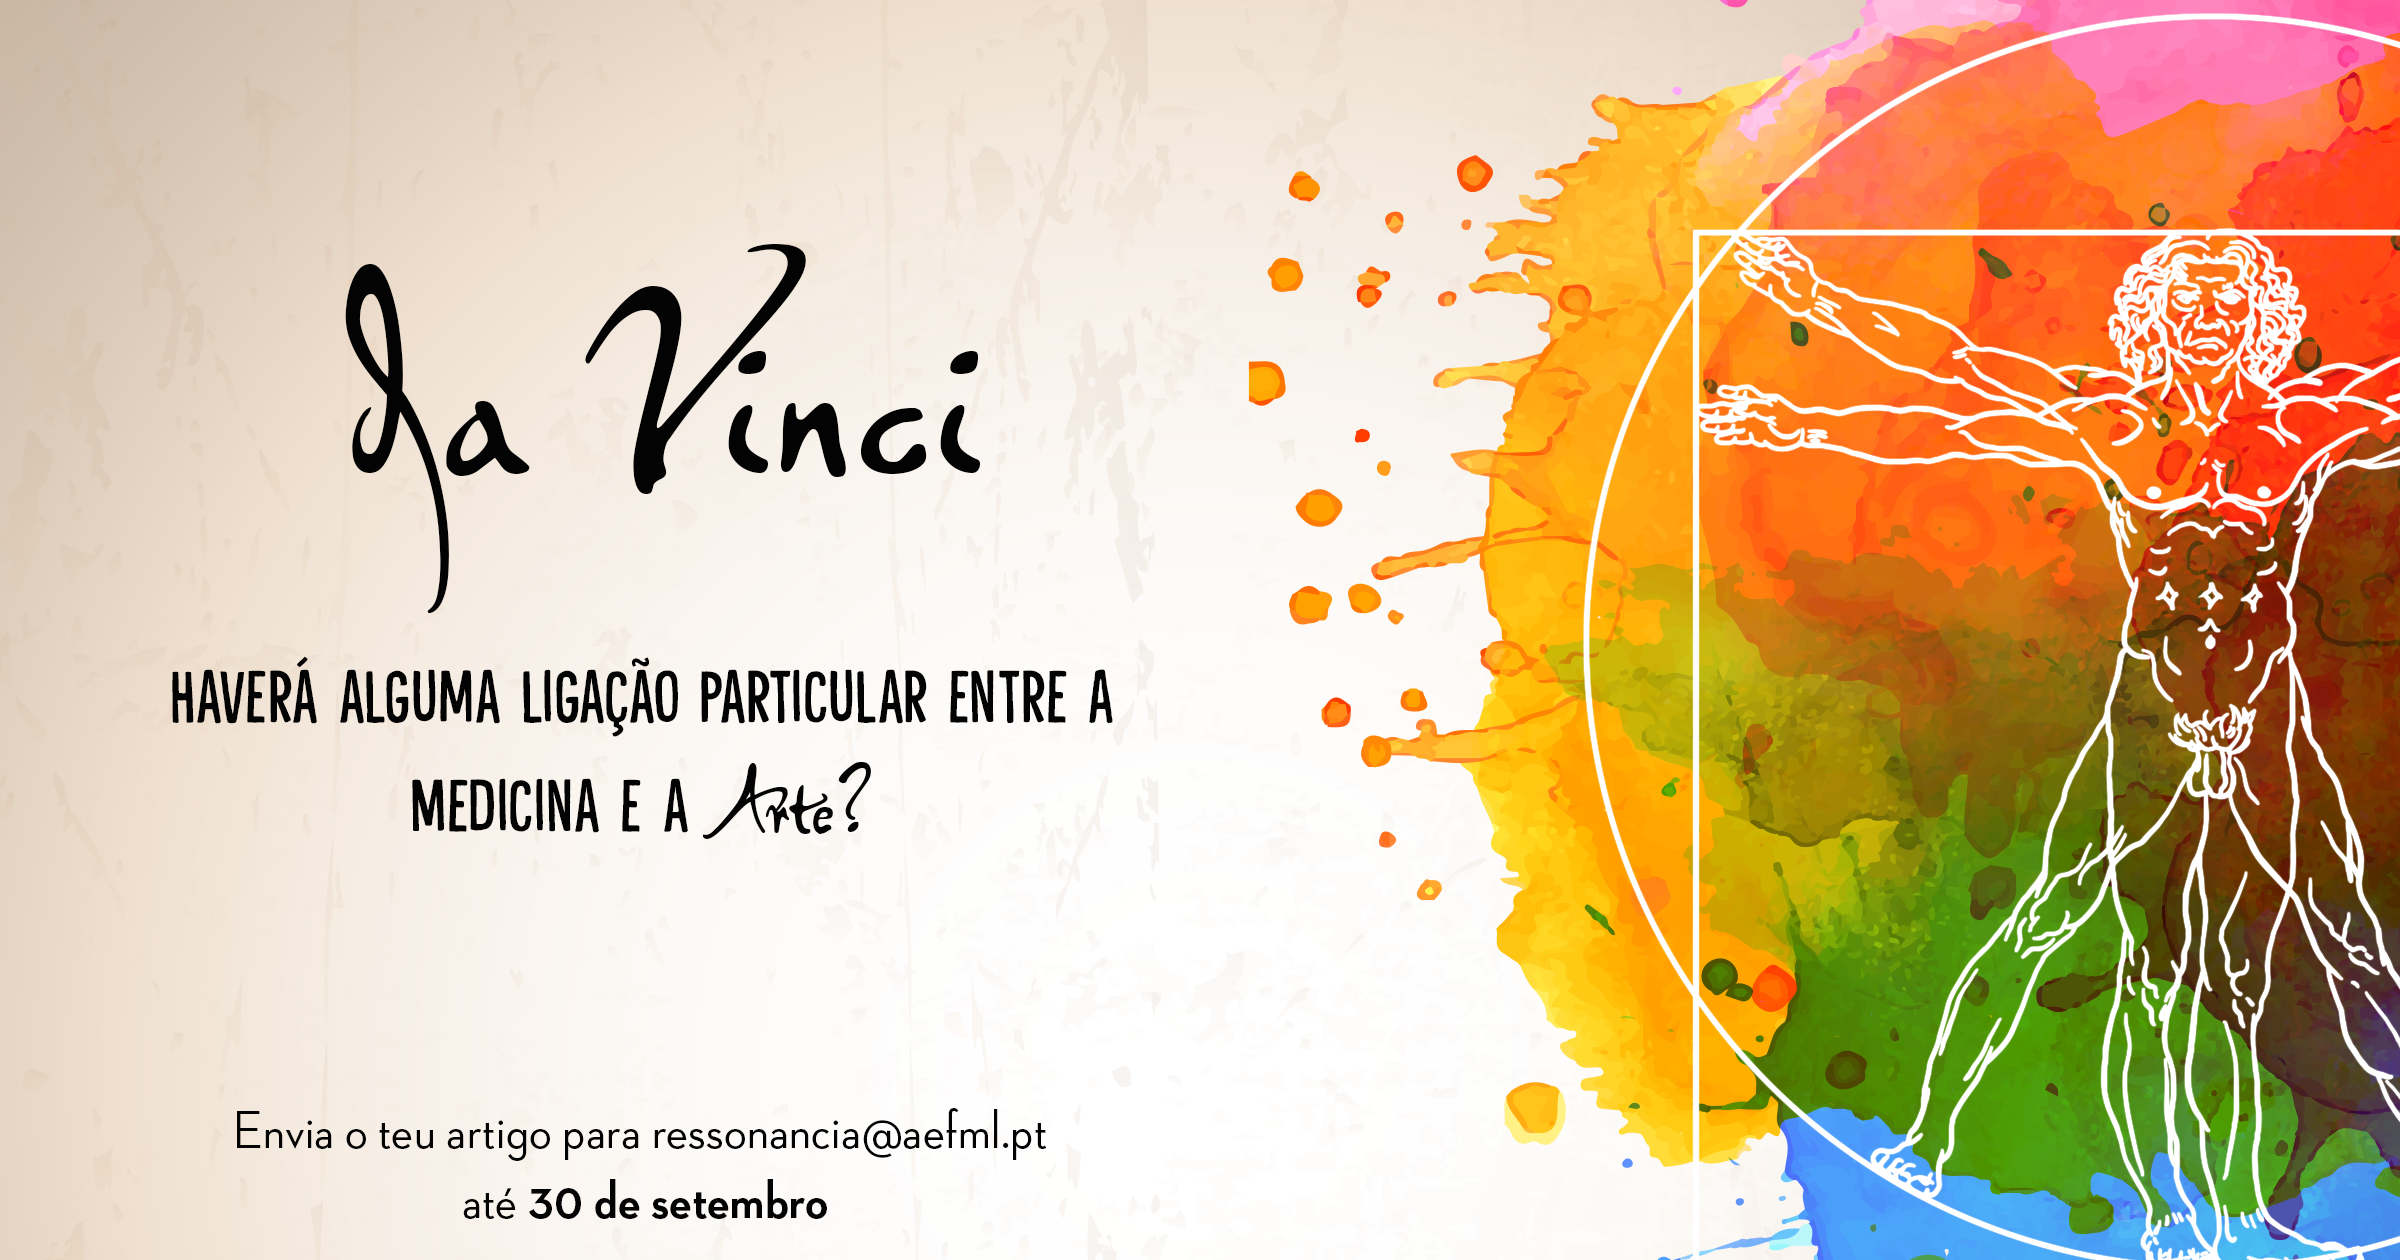 da_Vinci_BANNER.png